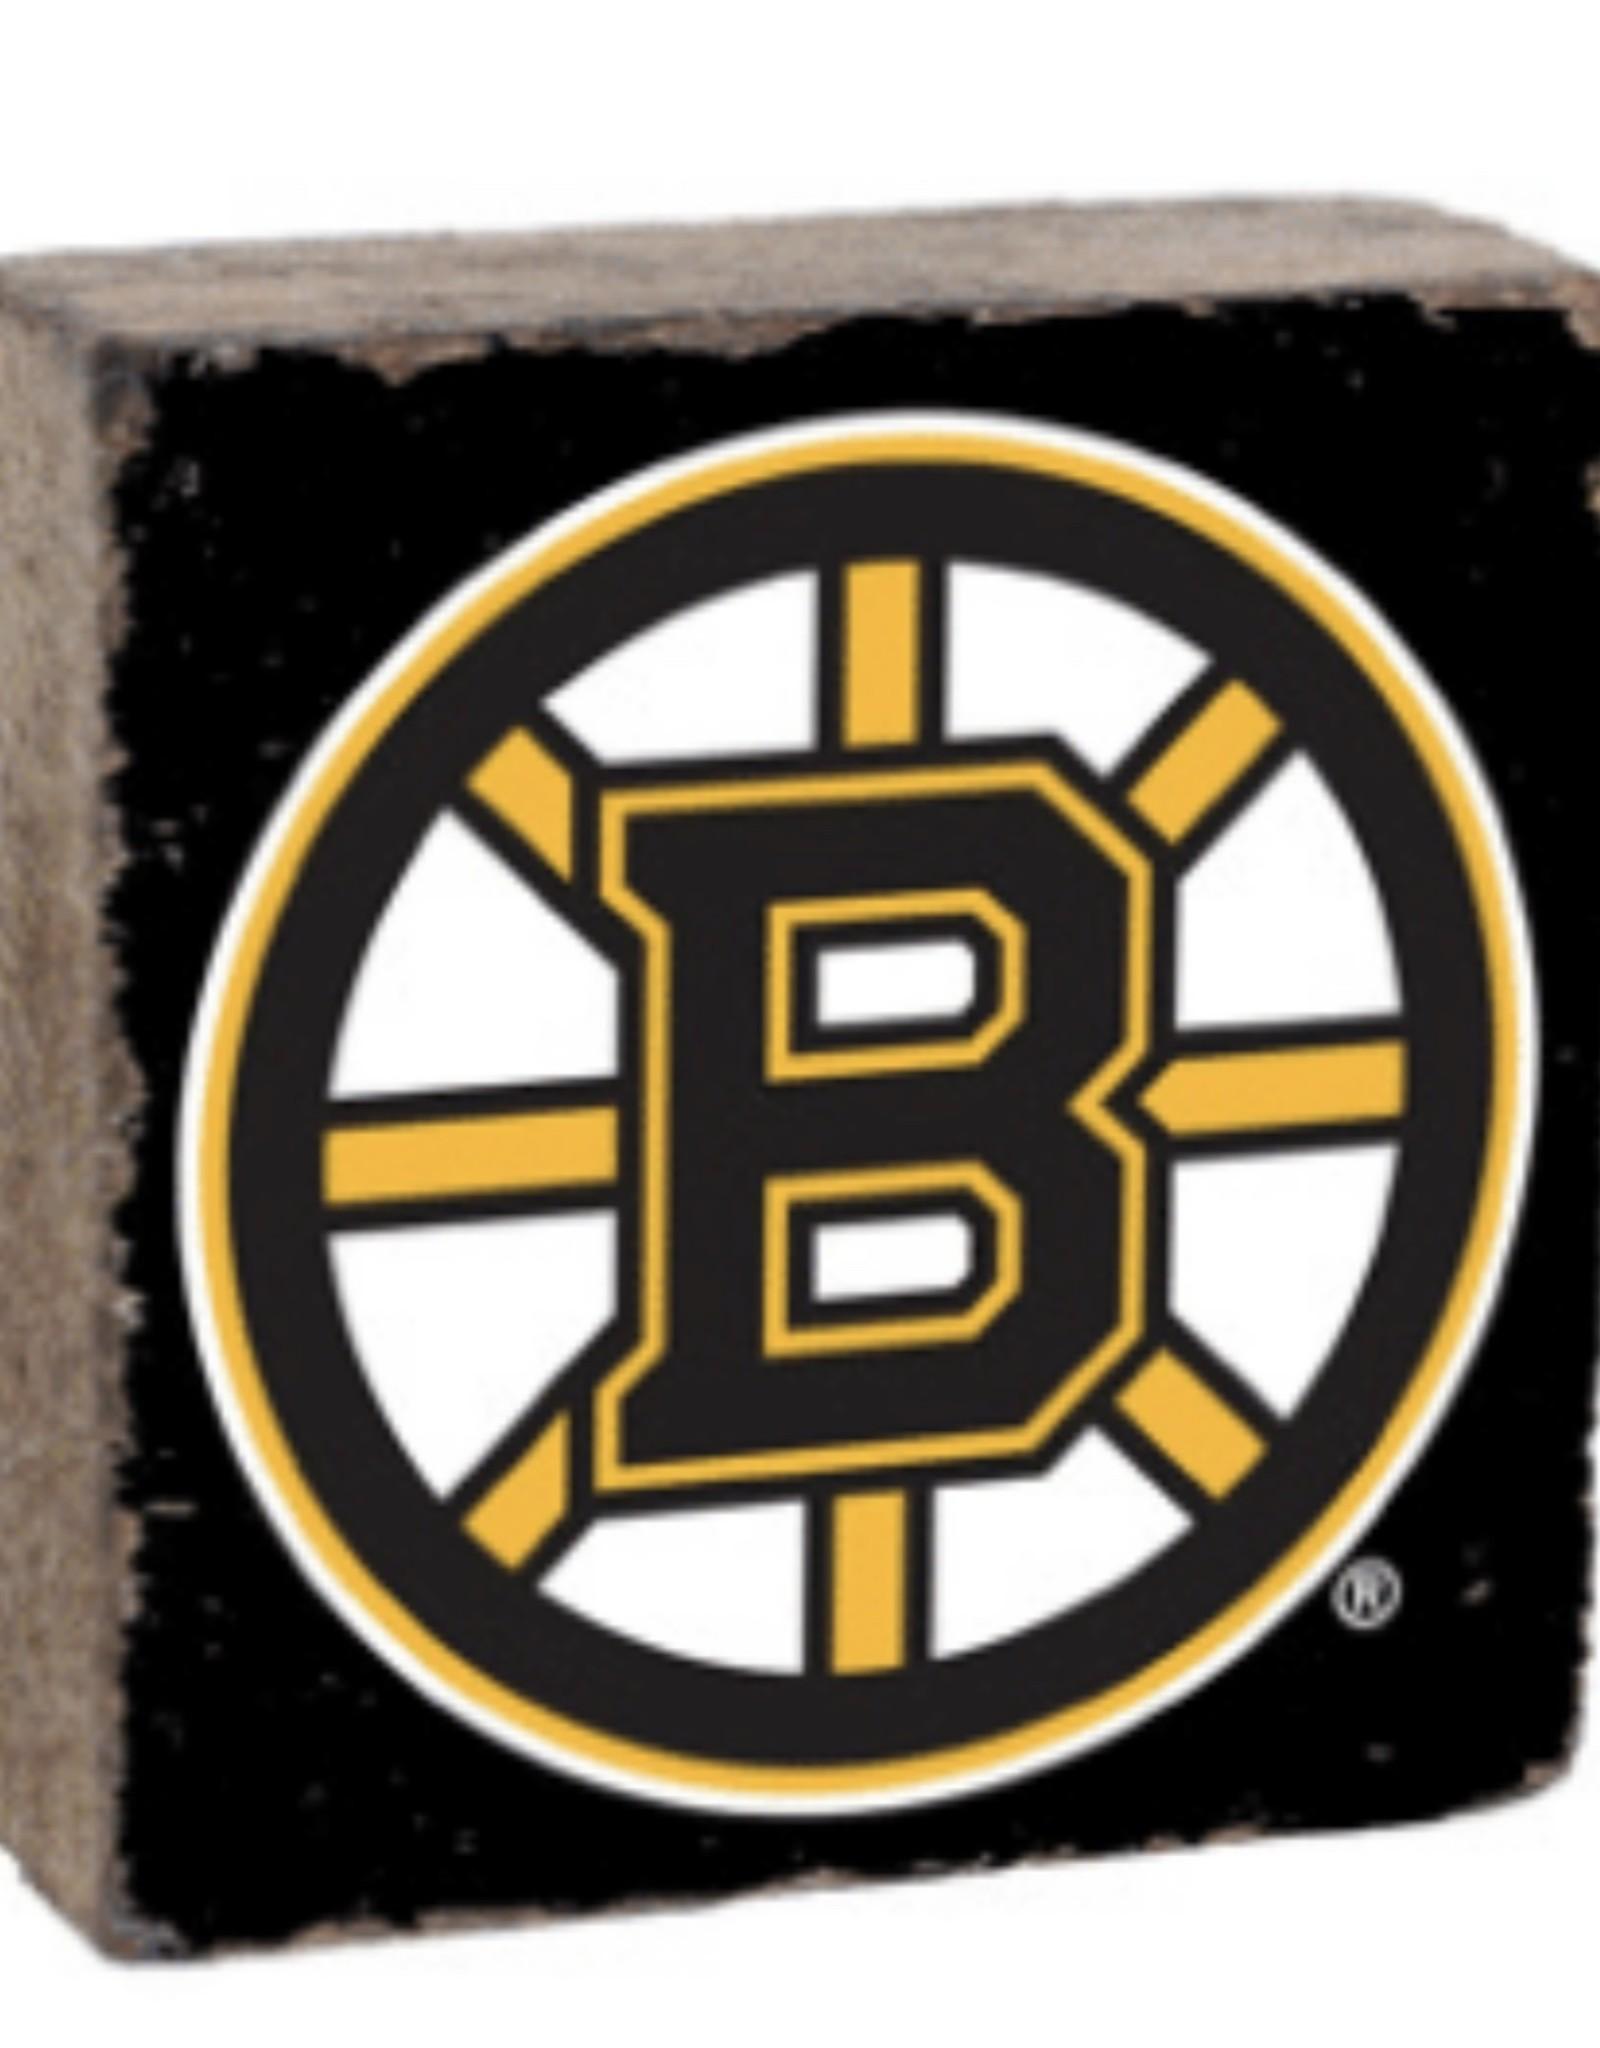 Rustic Marlin Rustic Marlin - NHL Bruins Block -Black